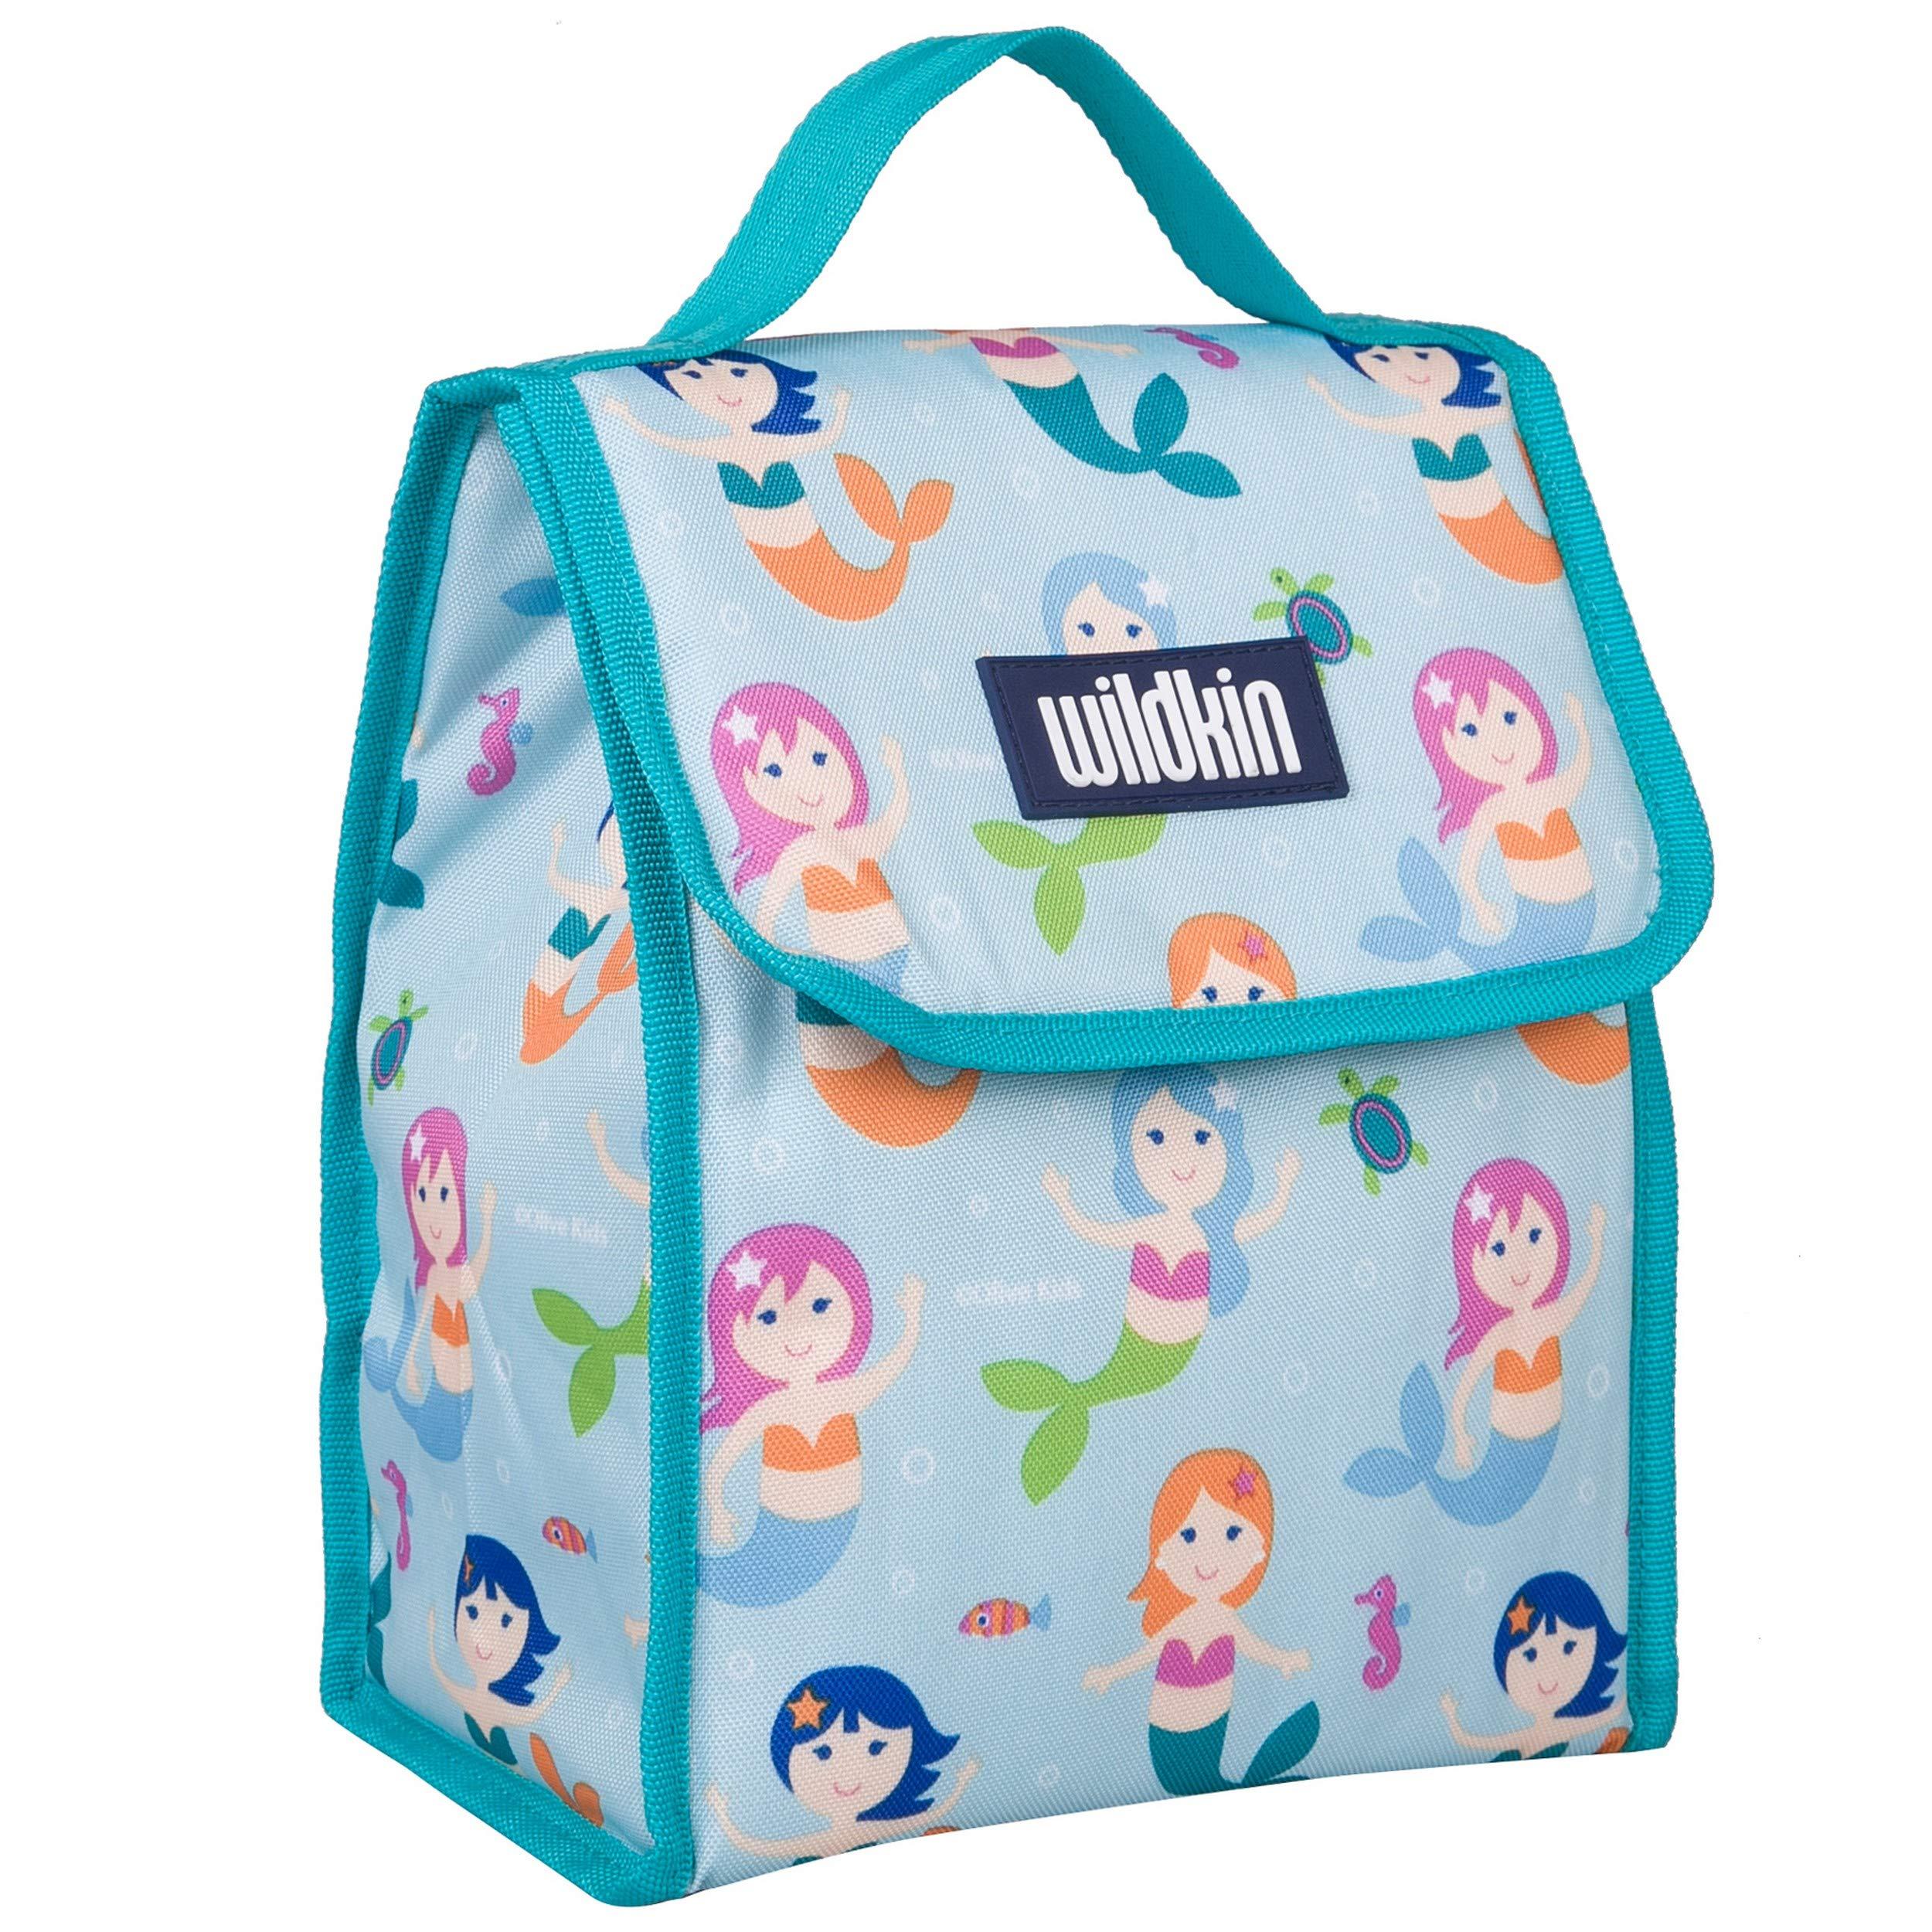 Dodocat Super Cute 3D Design Small Blue Bowknot Messenger Bag Kids Shoulder B...